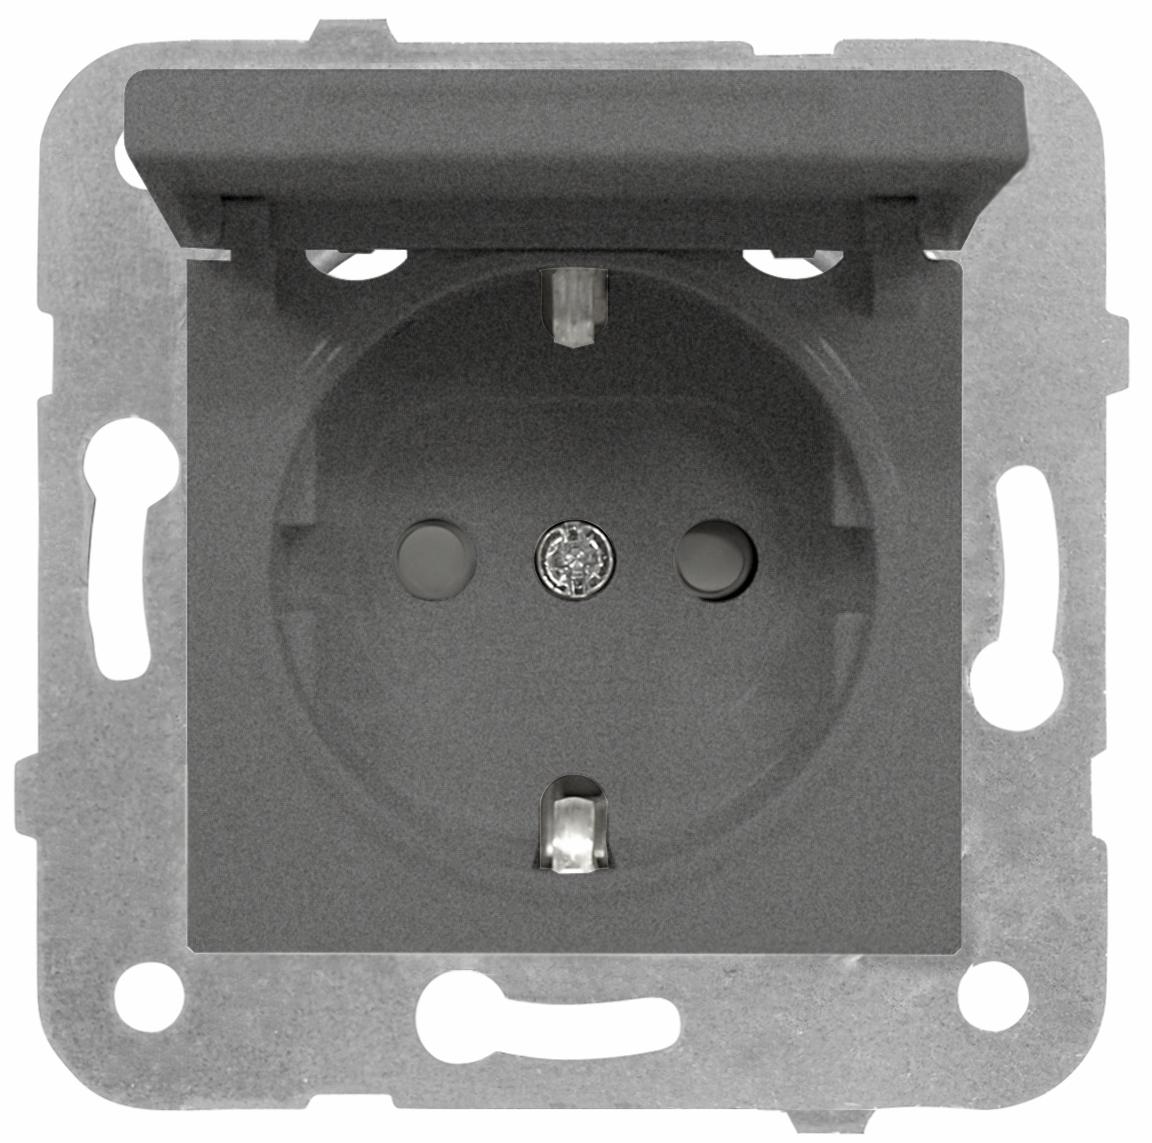 1 Stk Steckdose, erhöhter Berührungsschutz, Klappdeckel, Steckkl. EV111005--